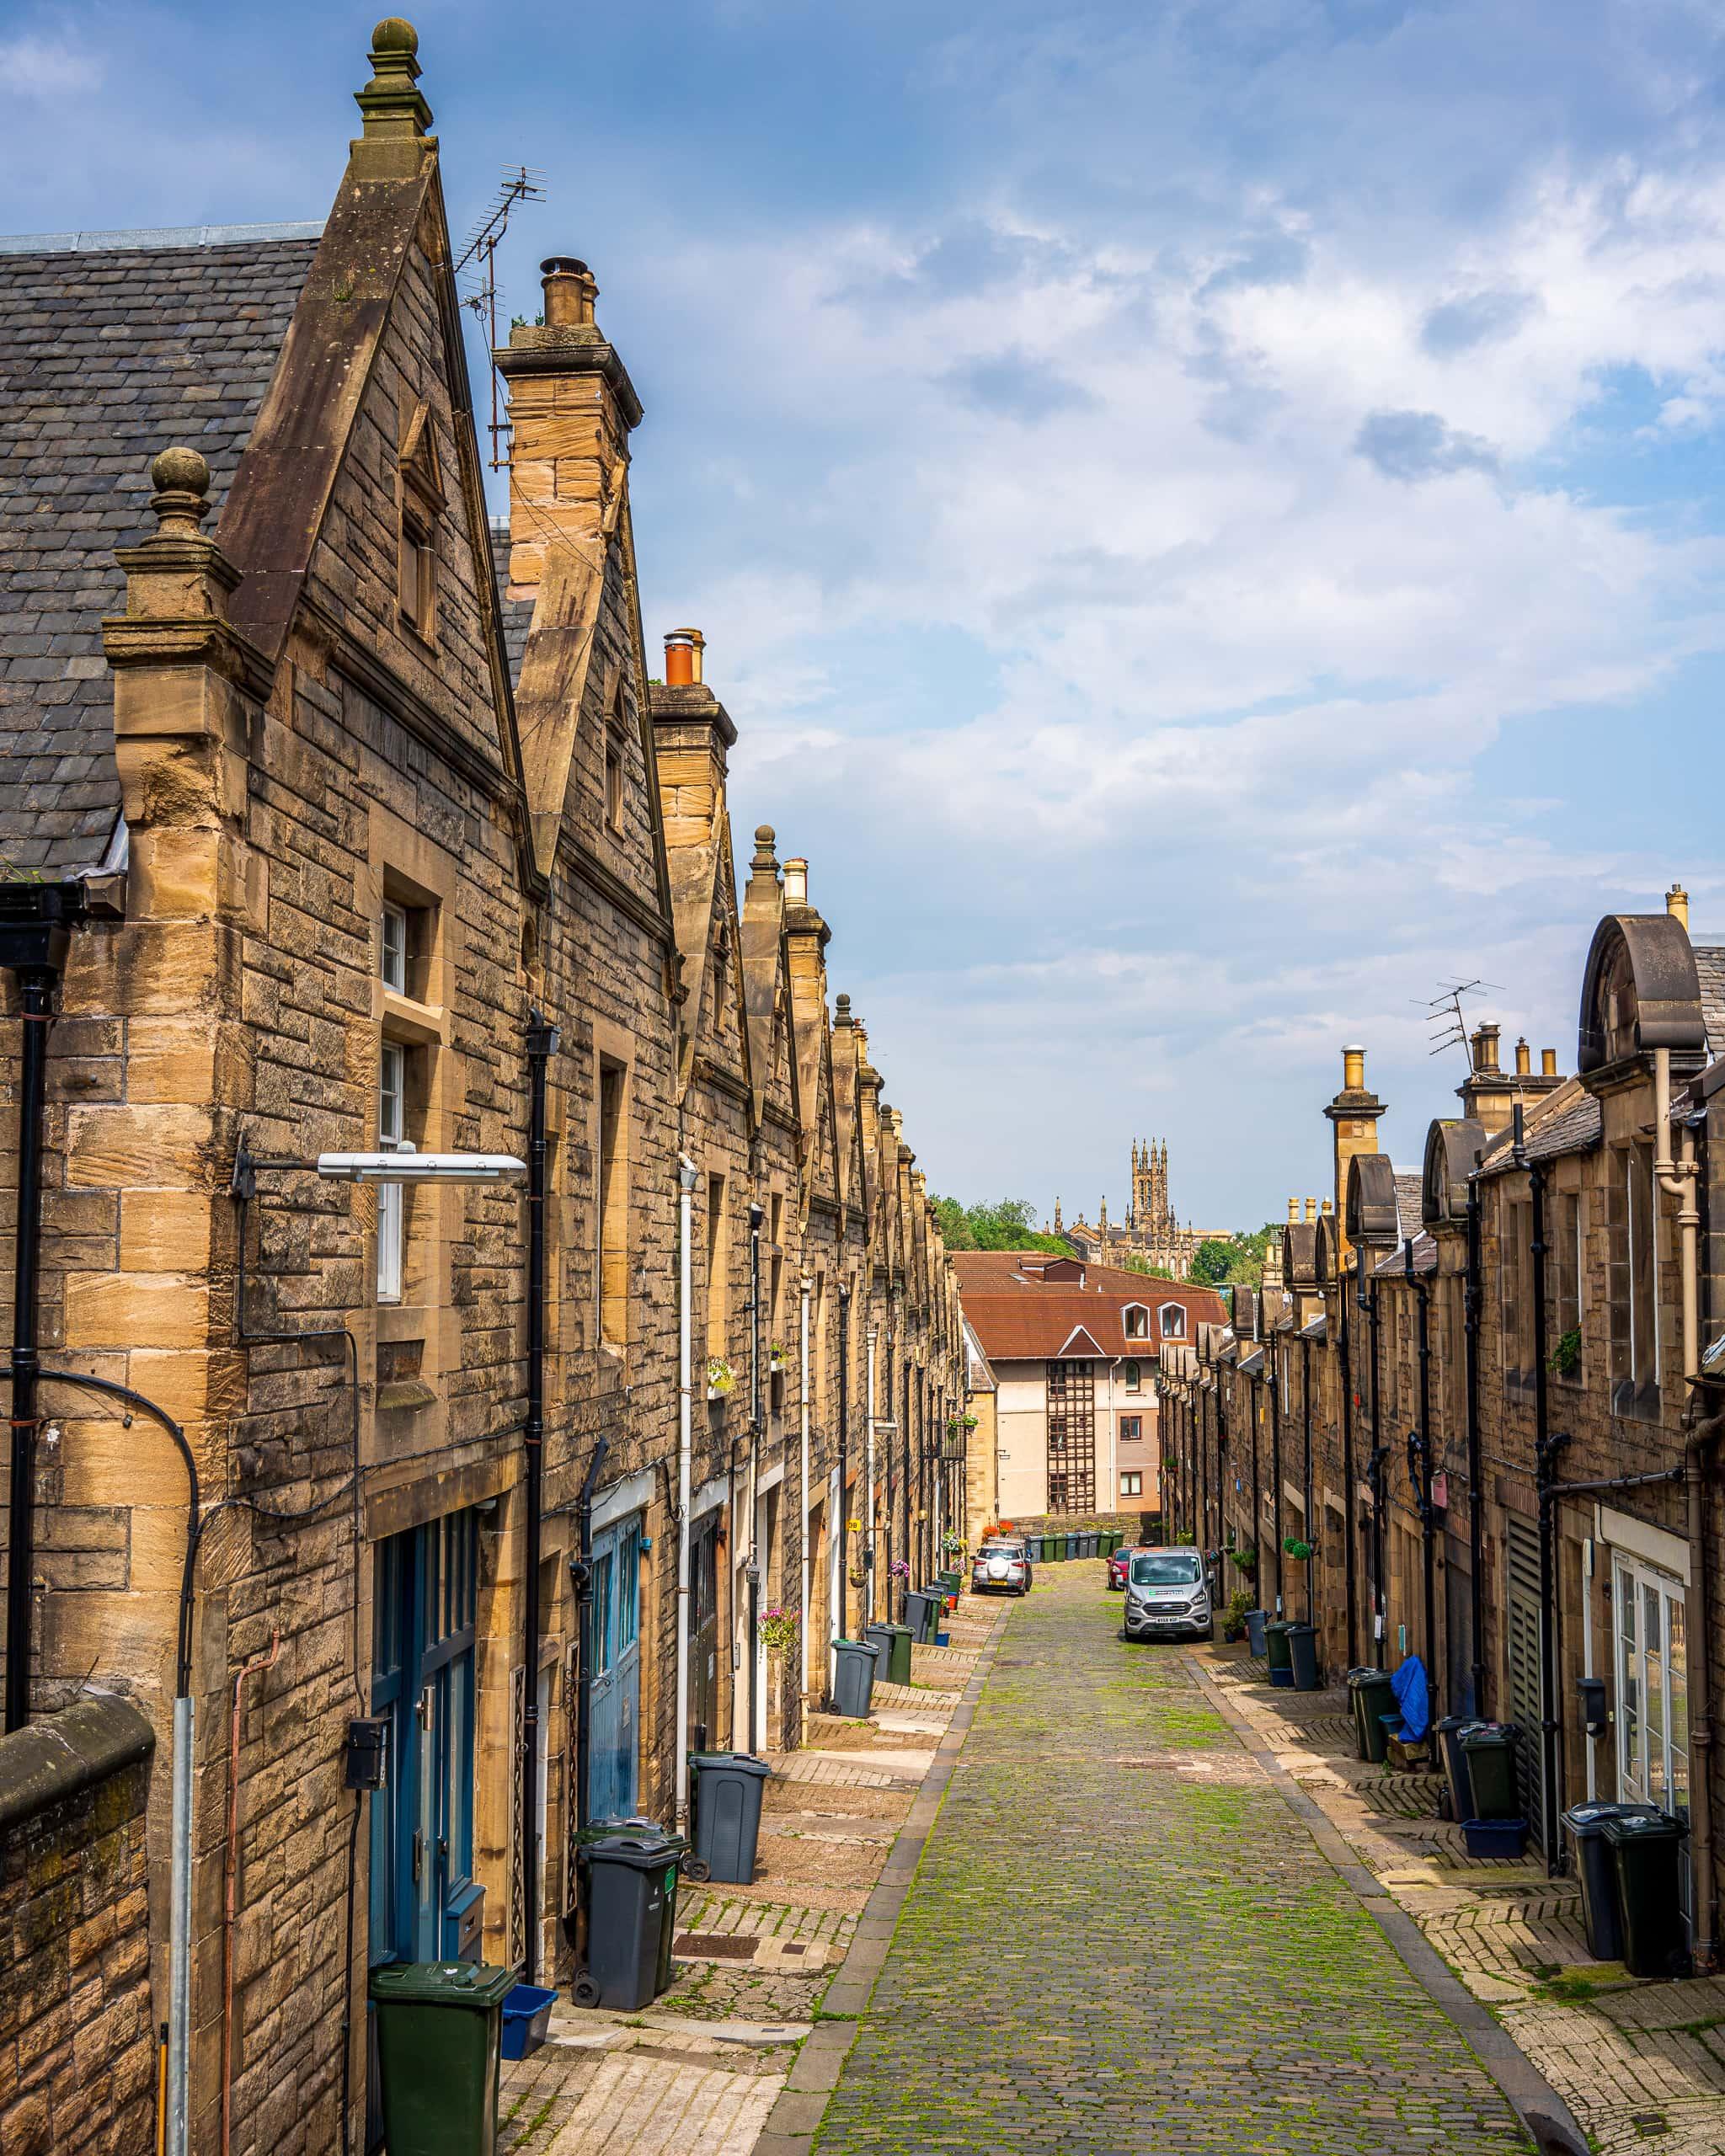 Street in Dean Village | f/8 1/320sec ISO-100 35mm  | ILCE-7RM3